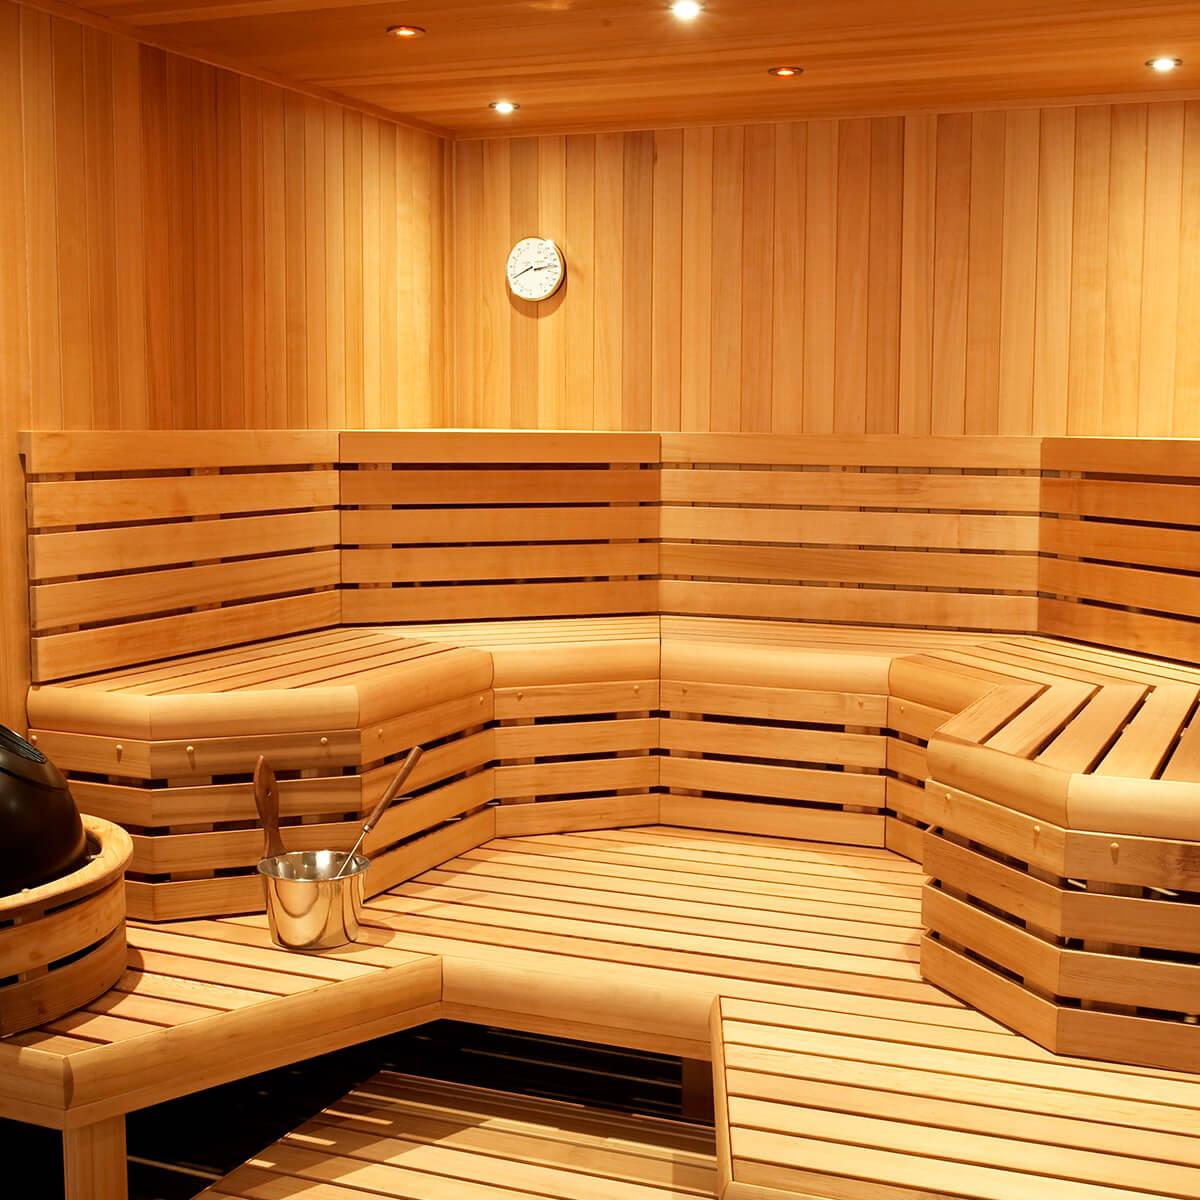 Finnleo Custom Cut Tradtional Saunas Product Image